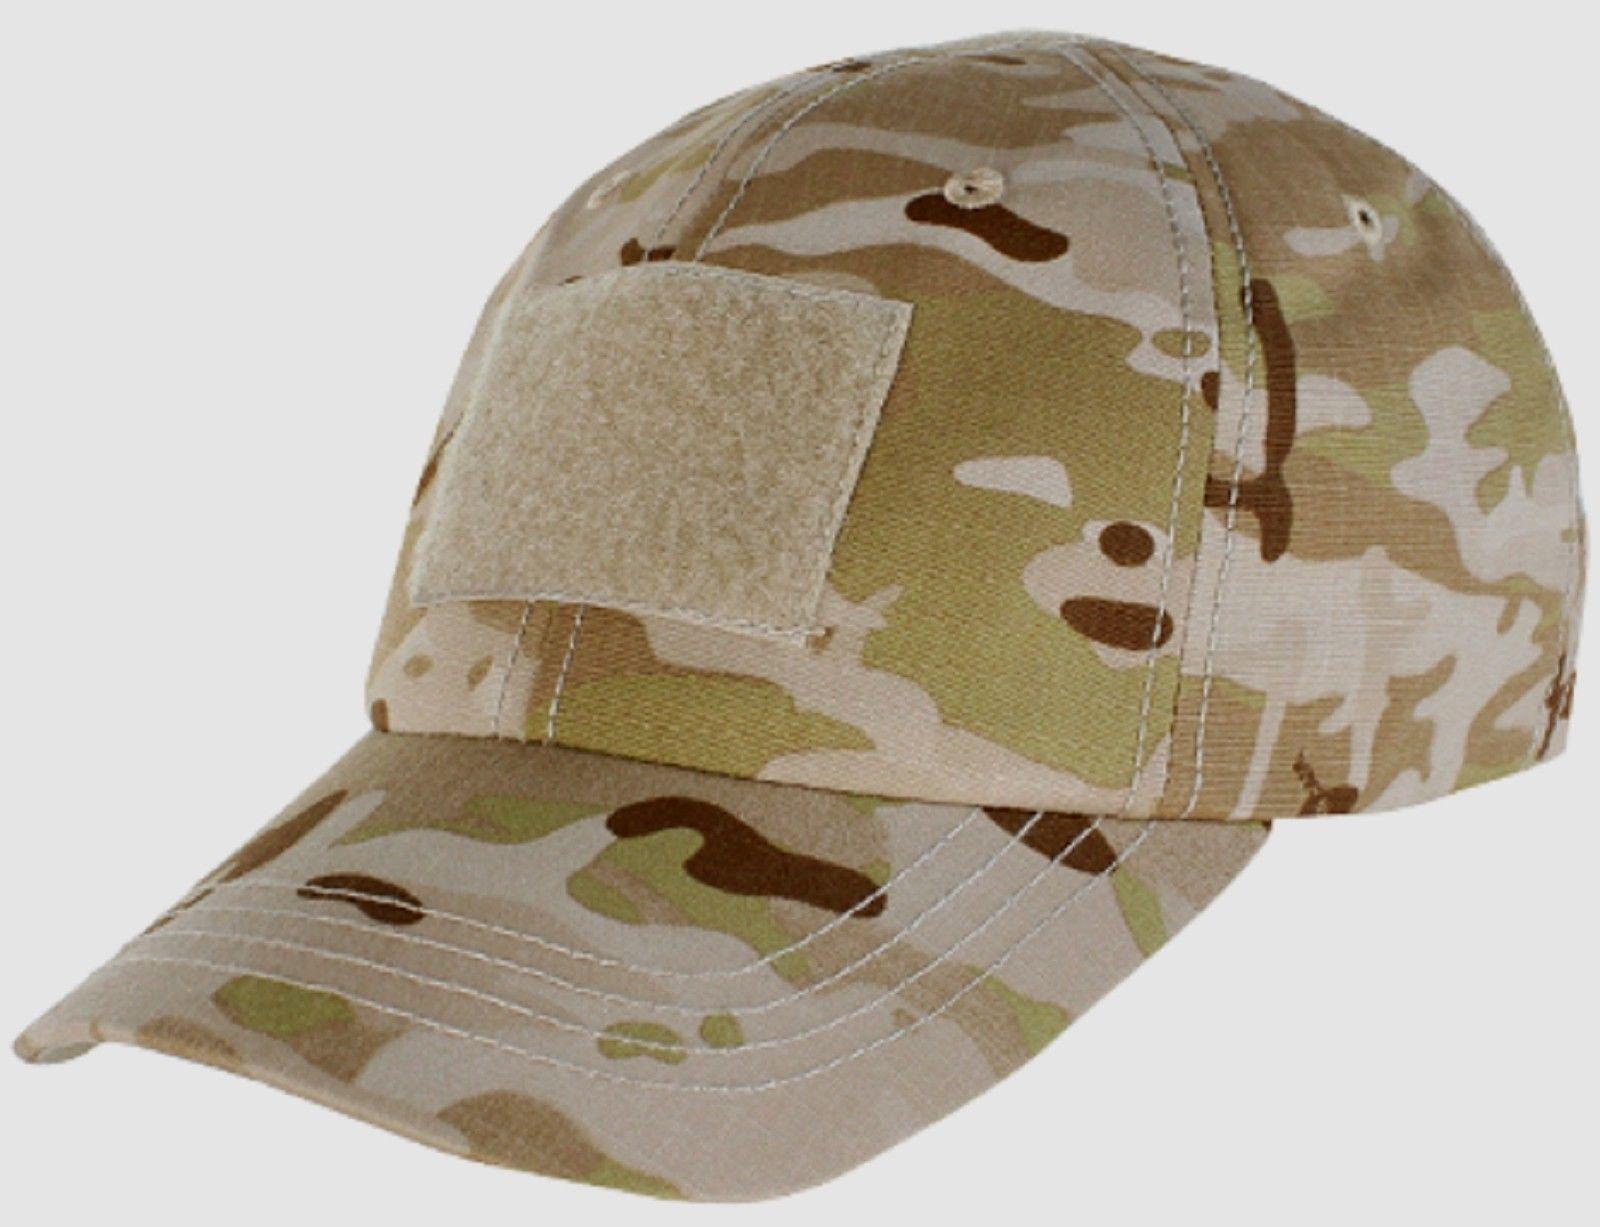 a8c6137a7616a MultiCam Arid Baseball-Style Tactical Cap Tropic Camo Military Operator Hat